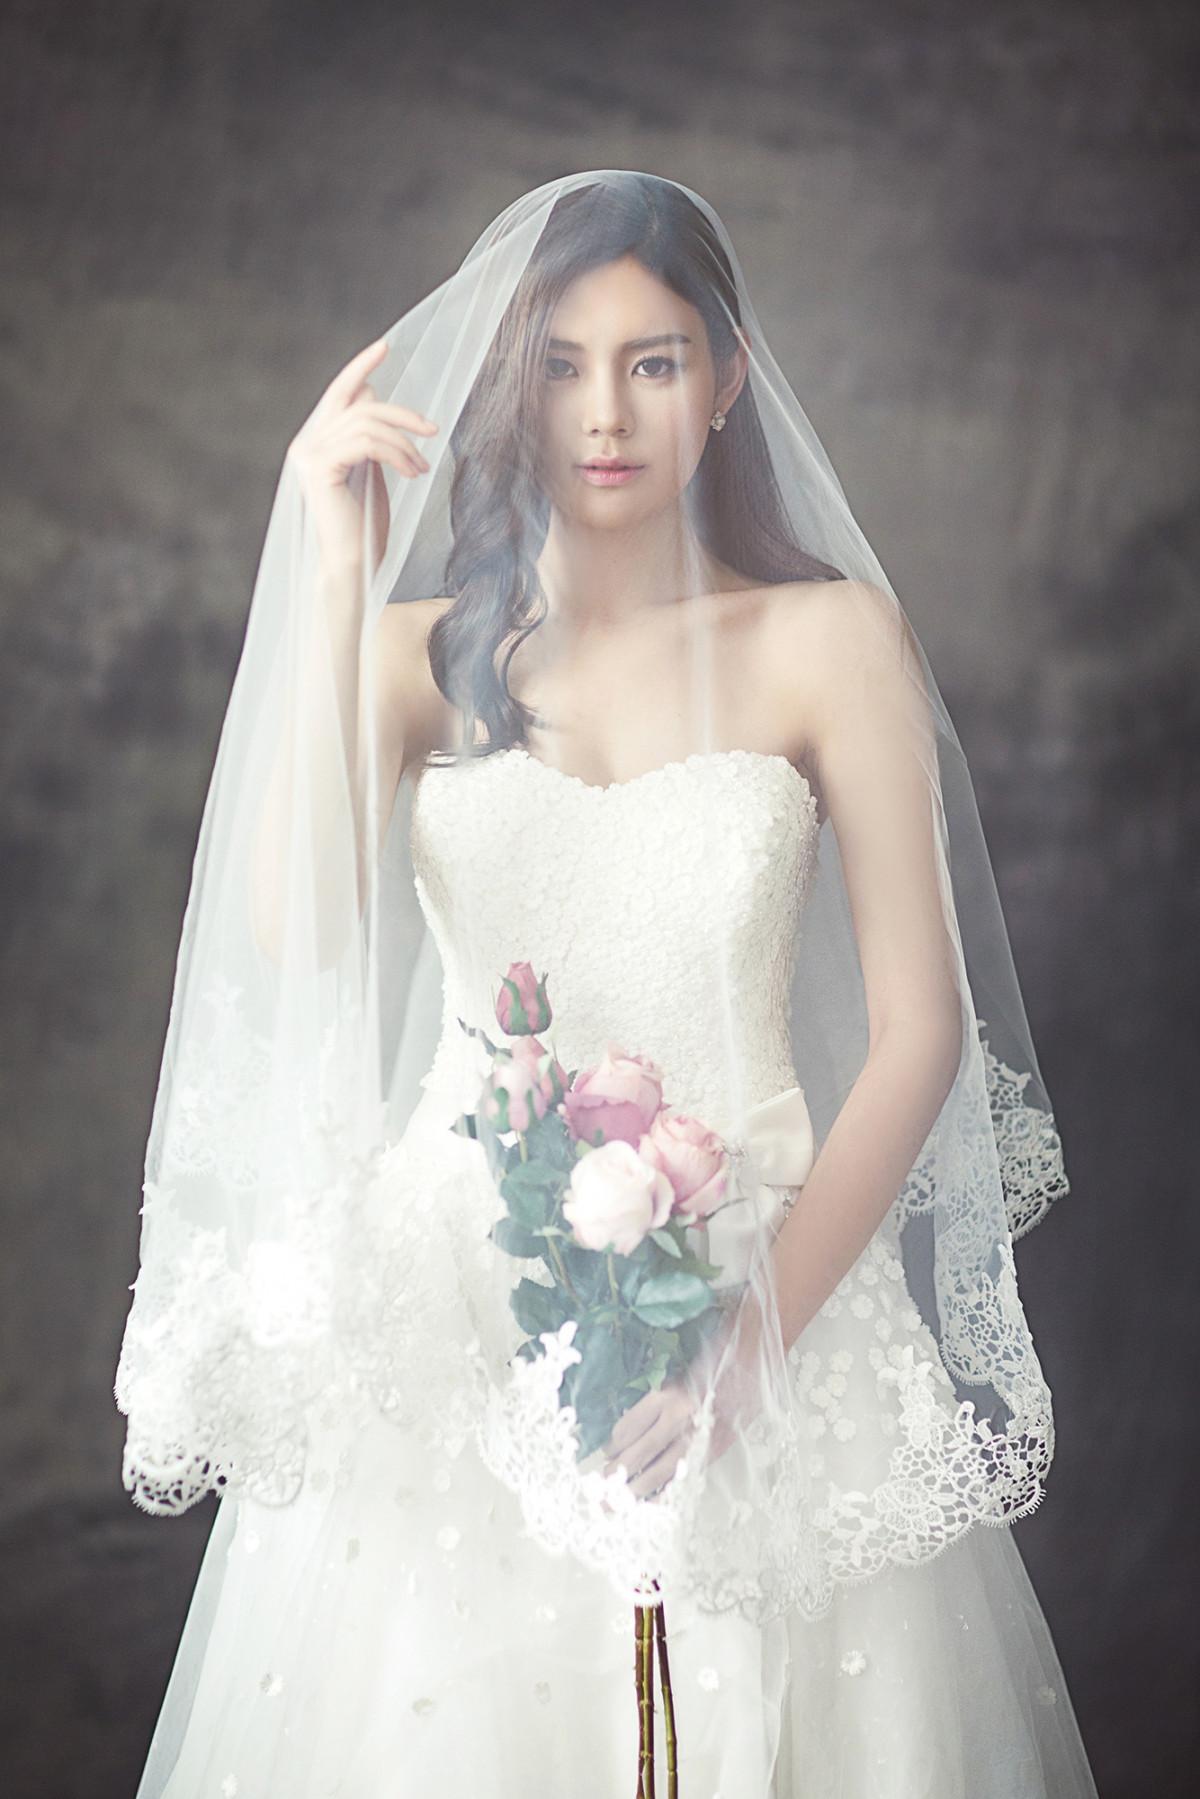 Free images flower wedding dress bride white dress for Wedding dresses for young brides